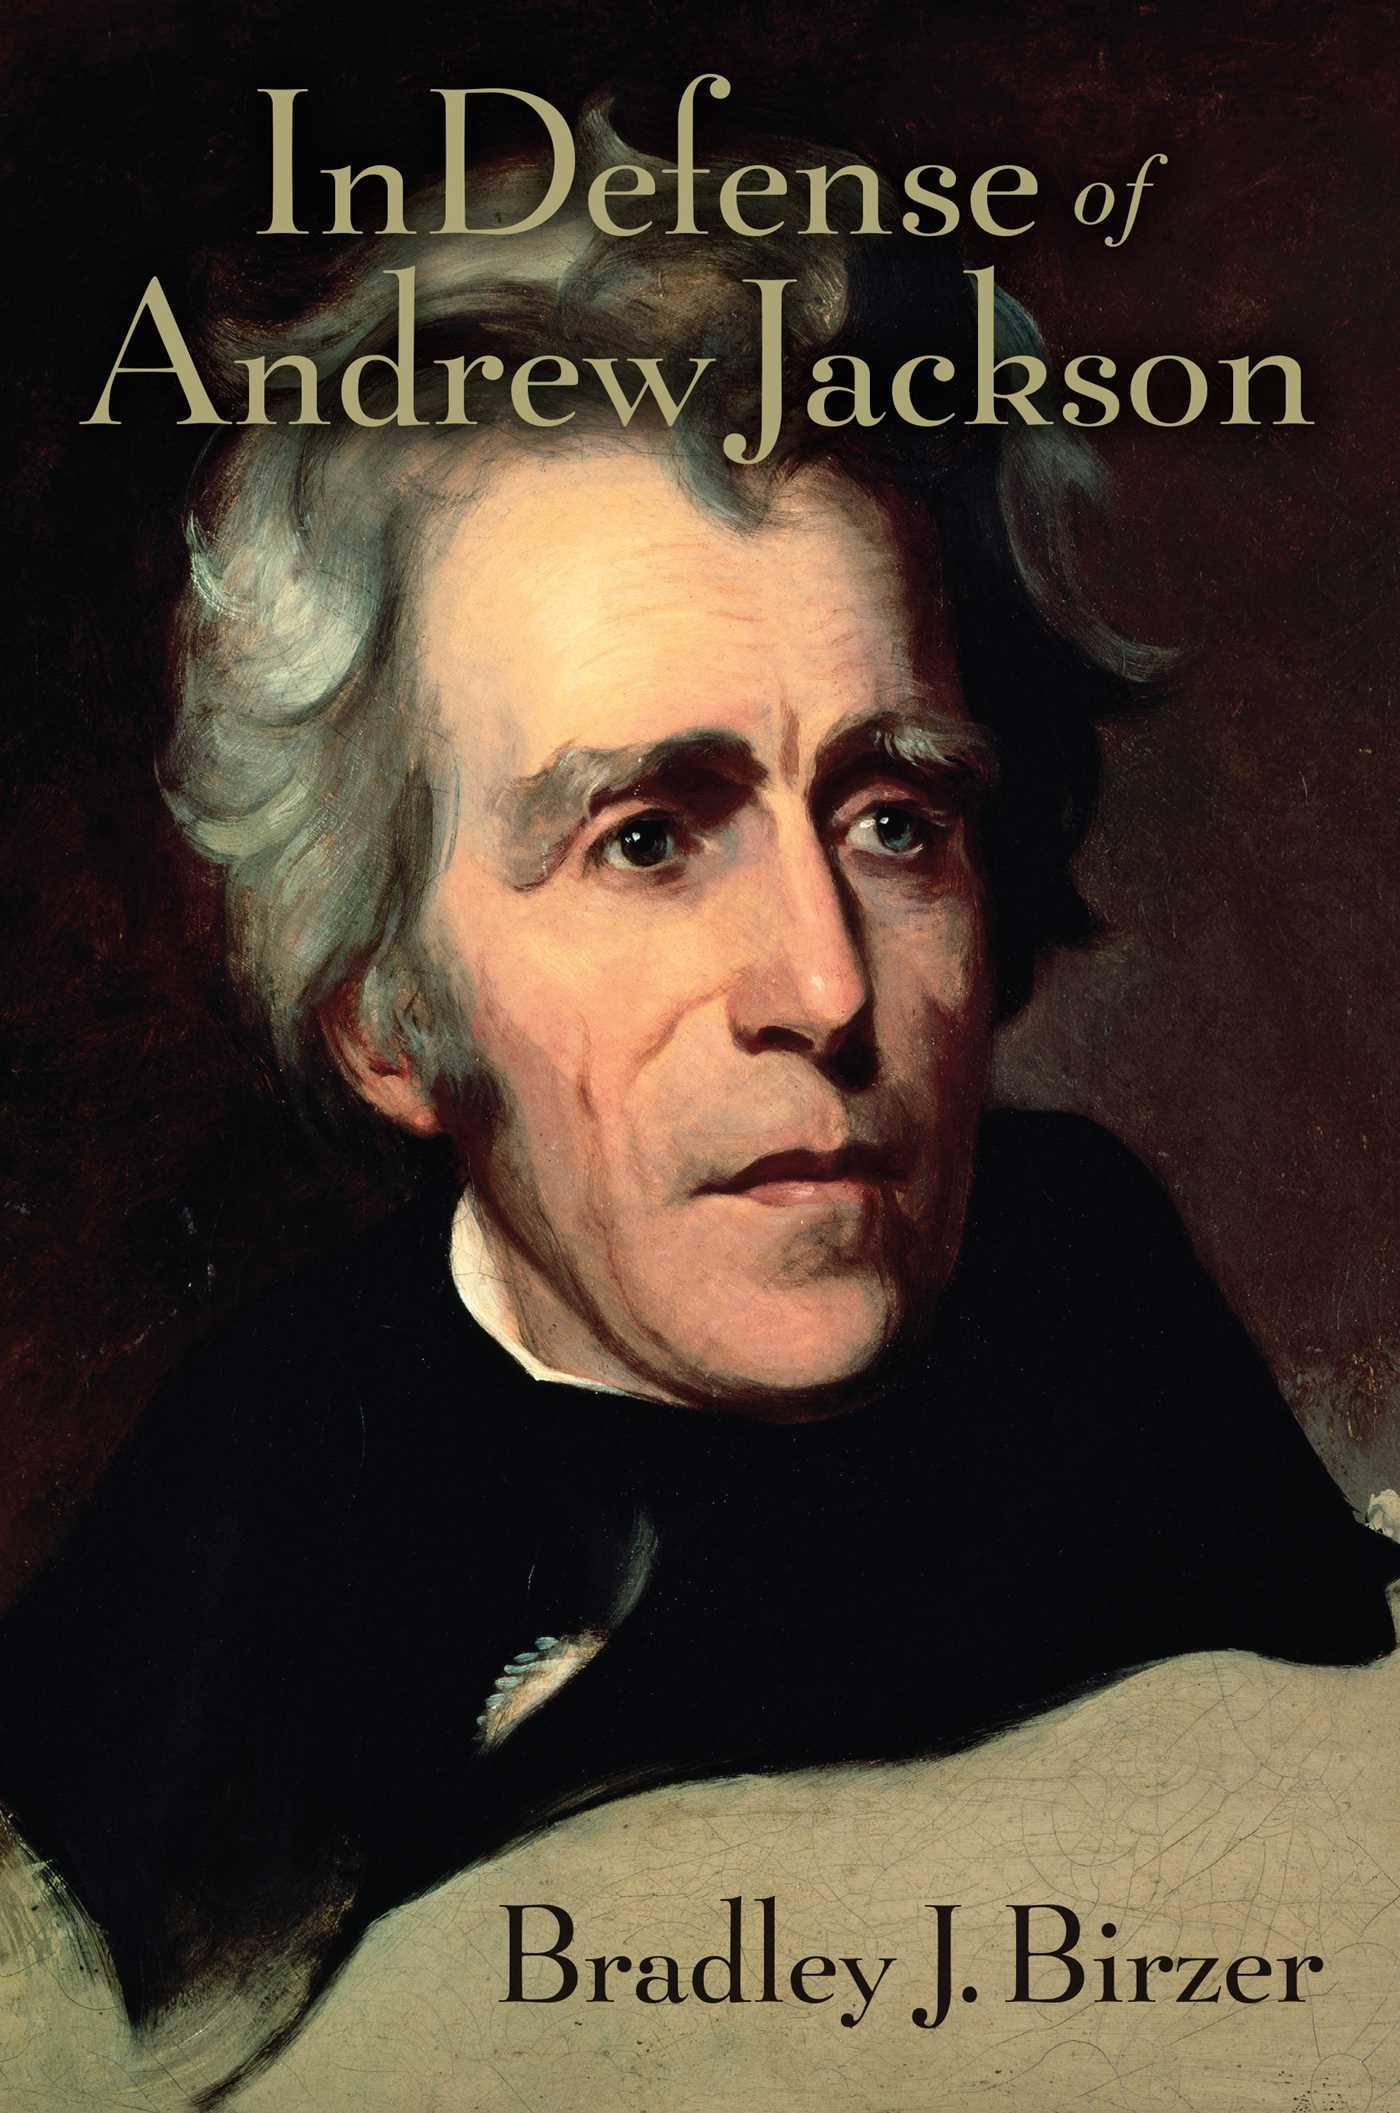 In defense of andrew jackson 9781621577287 hr